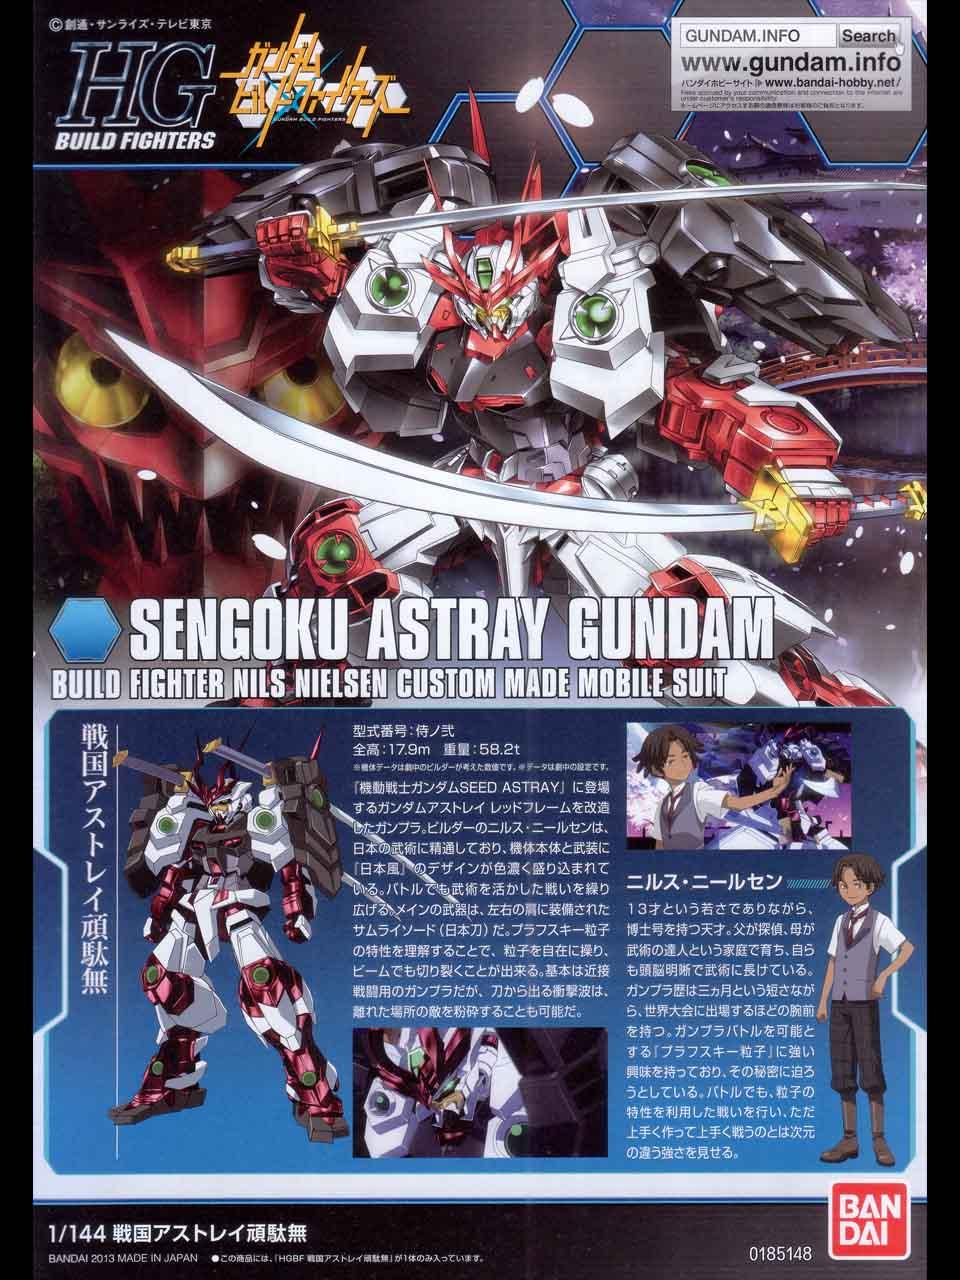 HGBF_Sengoku_Astray_Gundam_10.jpg